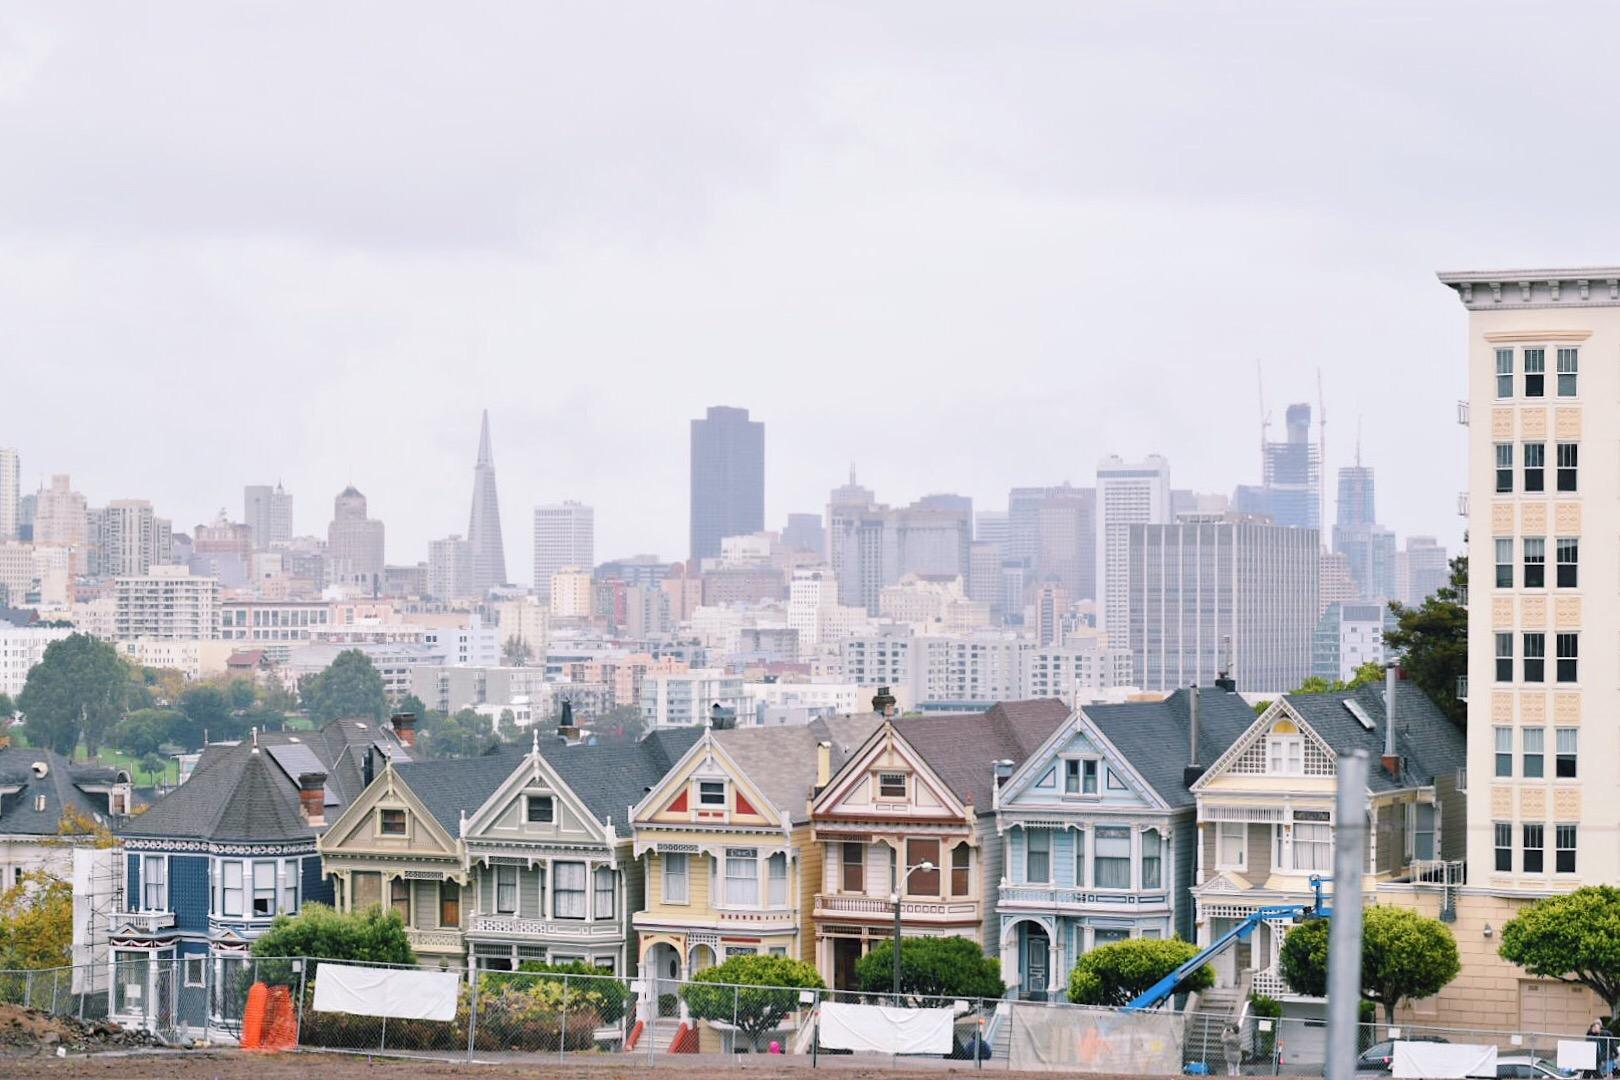 Sisters in San Francisco